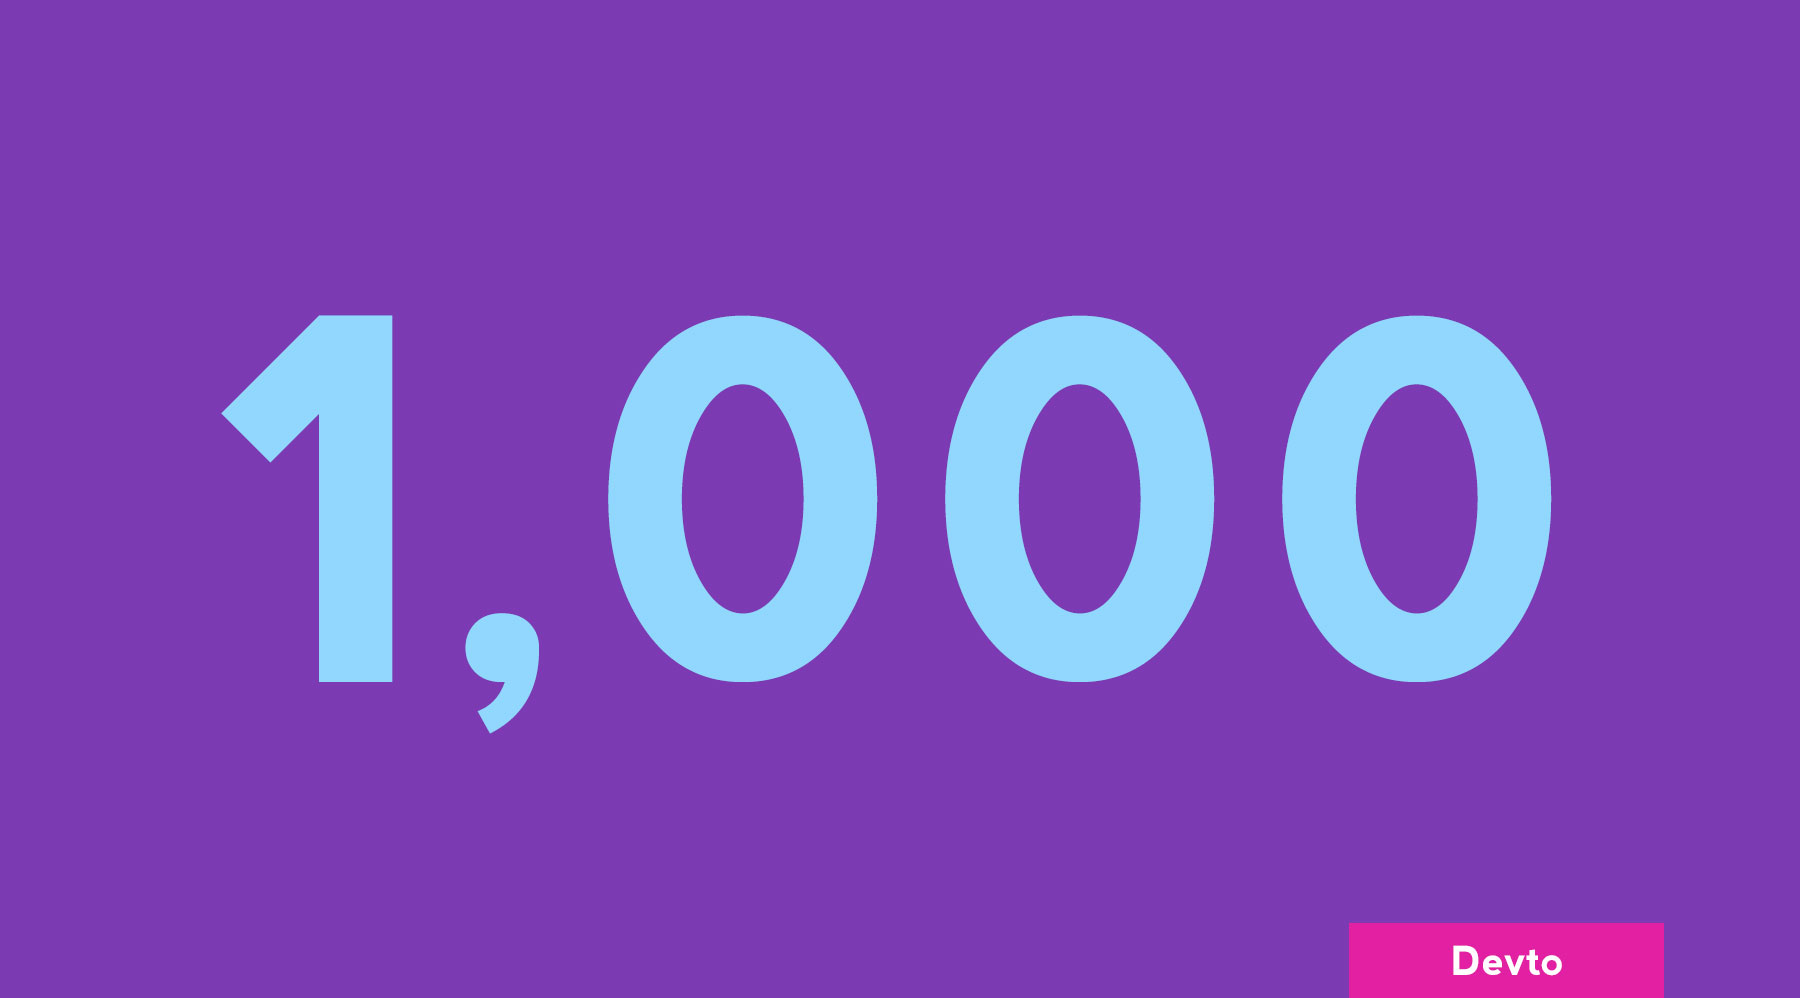 1K Dev.to Followers